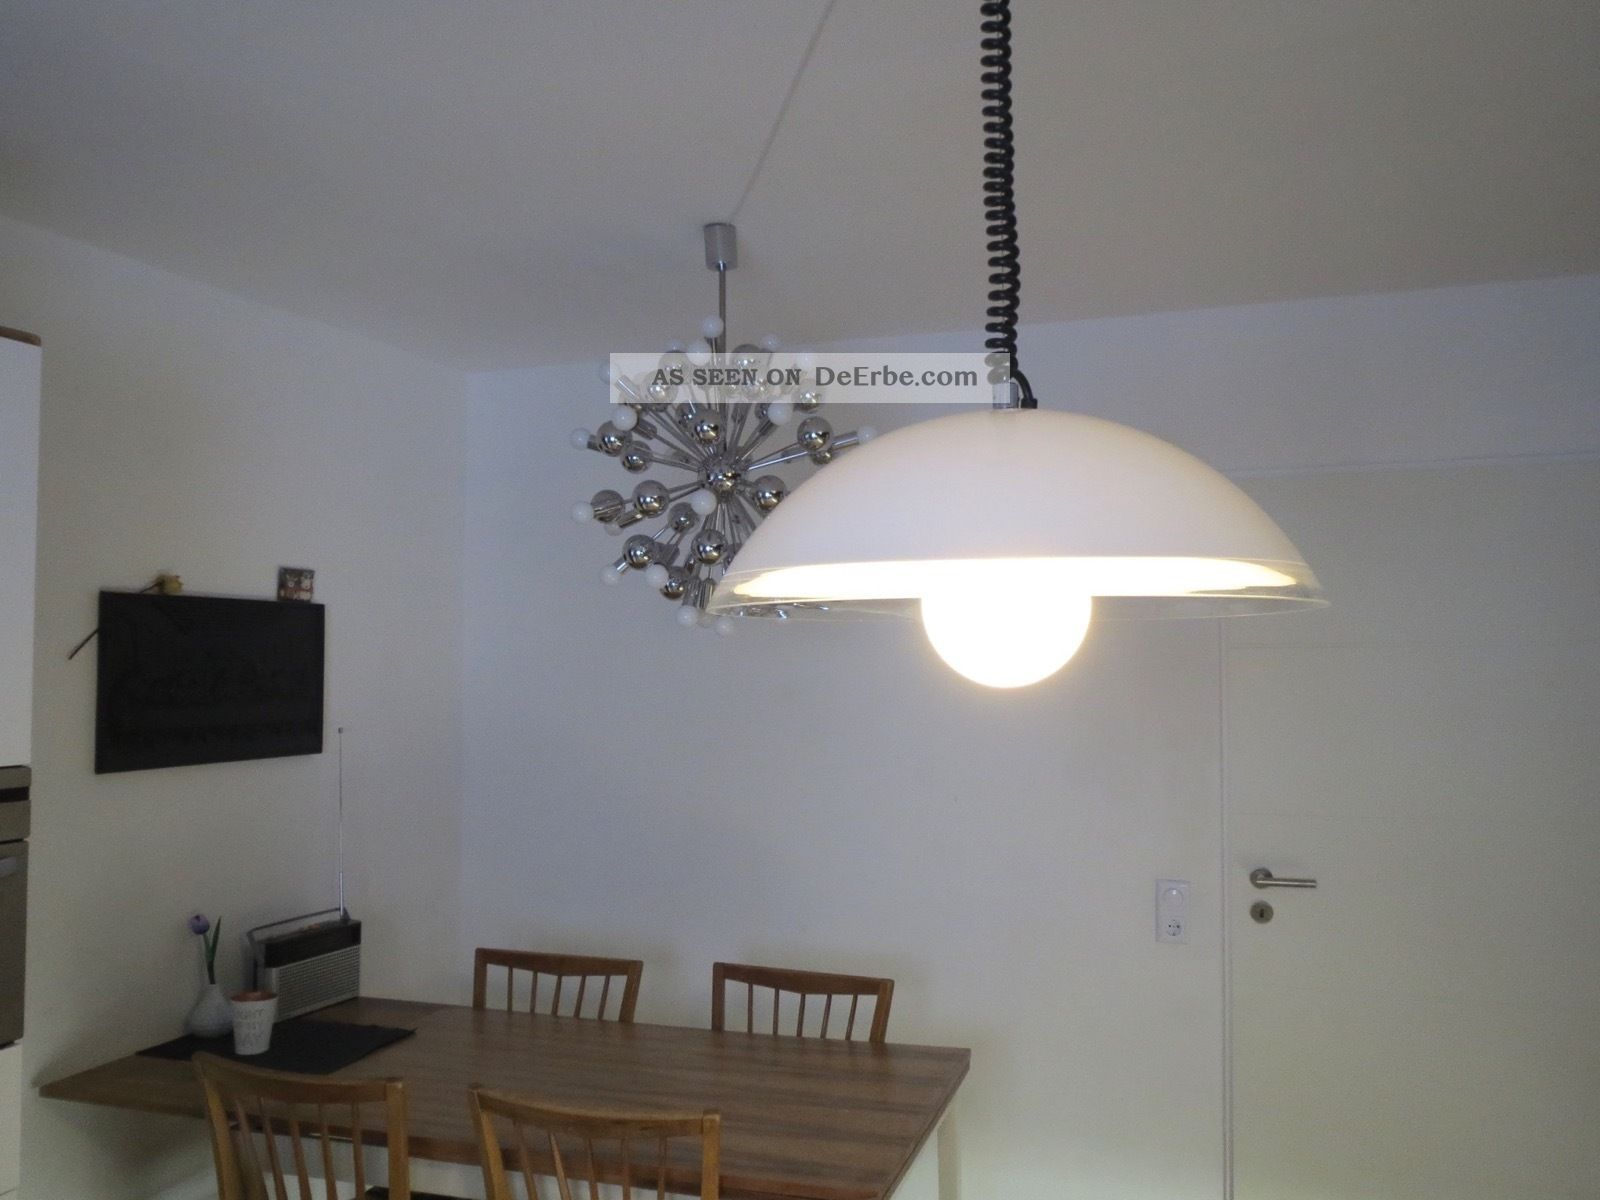 Iguzzini pendel lampe acryl made in italy design 70er panton - Lampe made in design ...